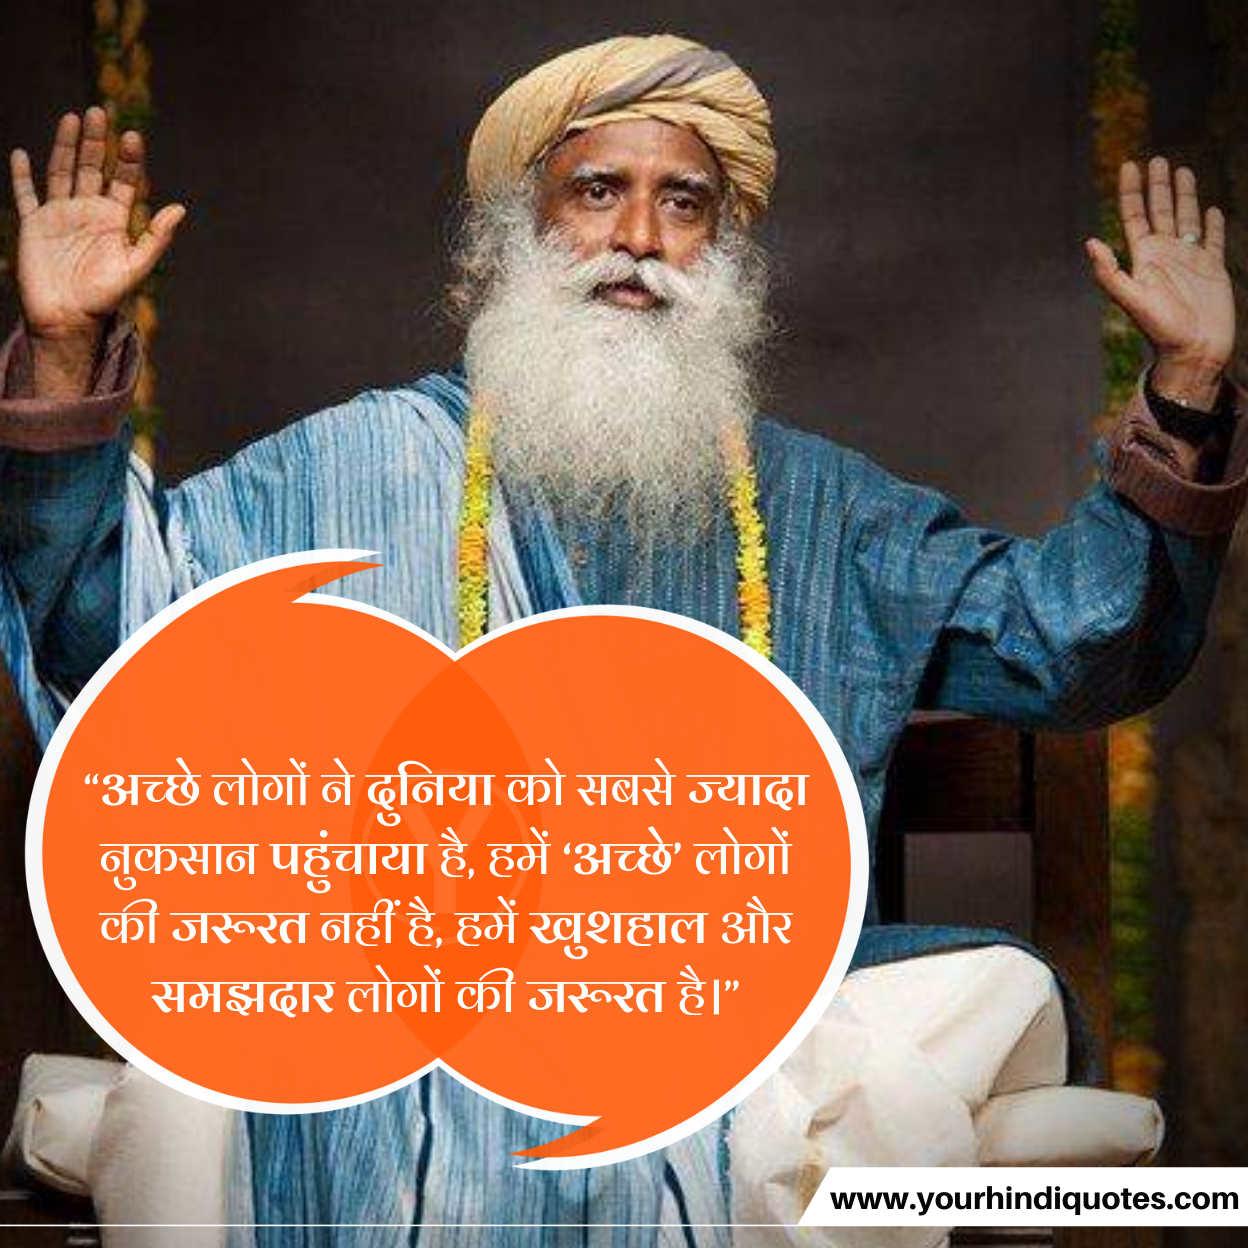 Sadhguru Quotes Hindi Pictures